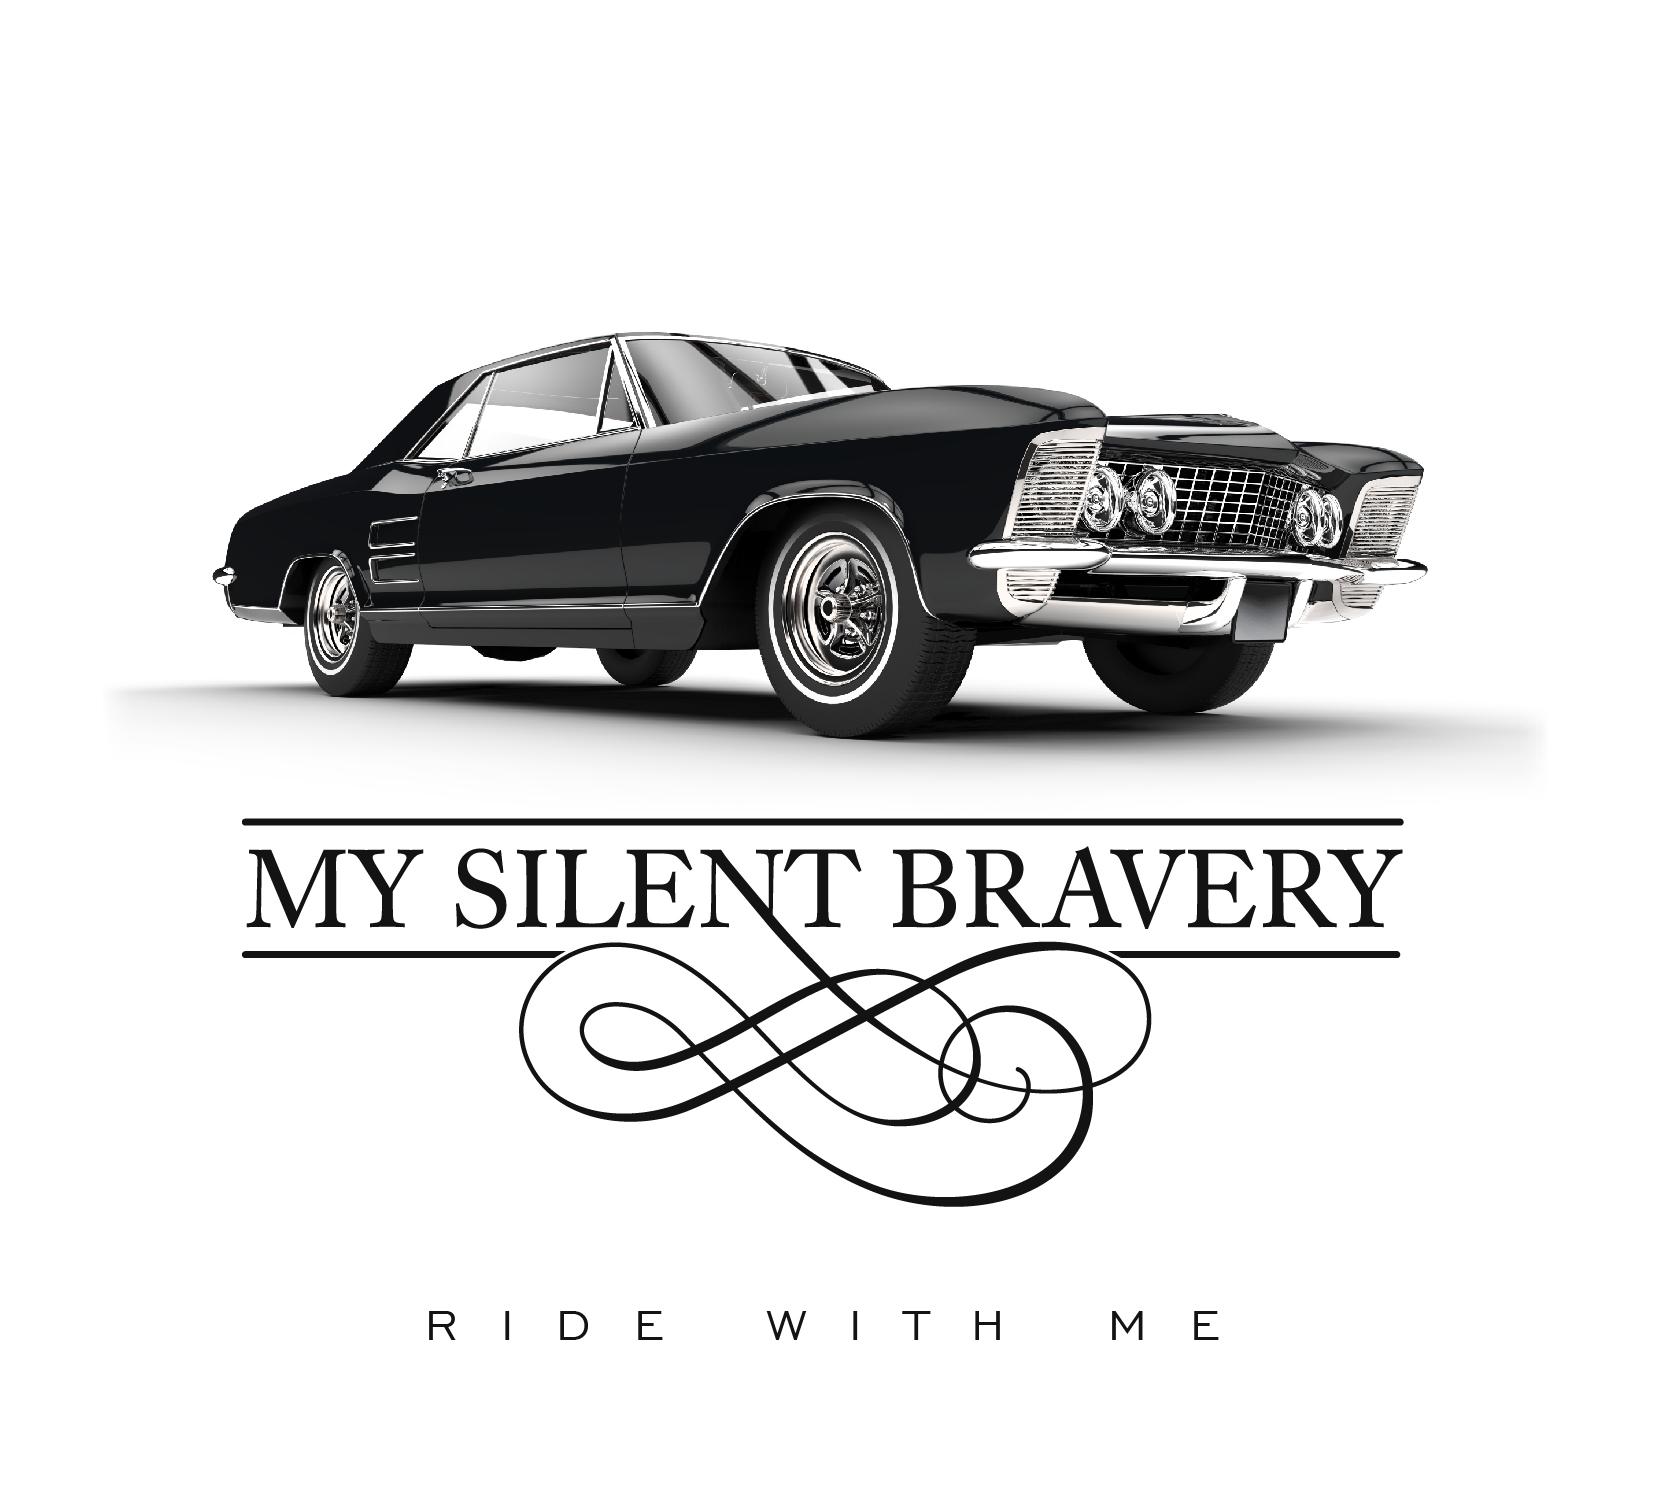 Music   My Silent Bravery - Listen to MSB's Inspirational